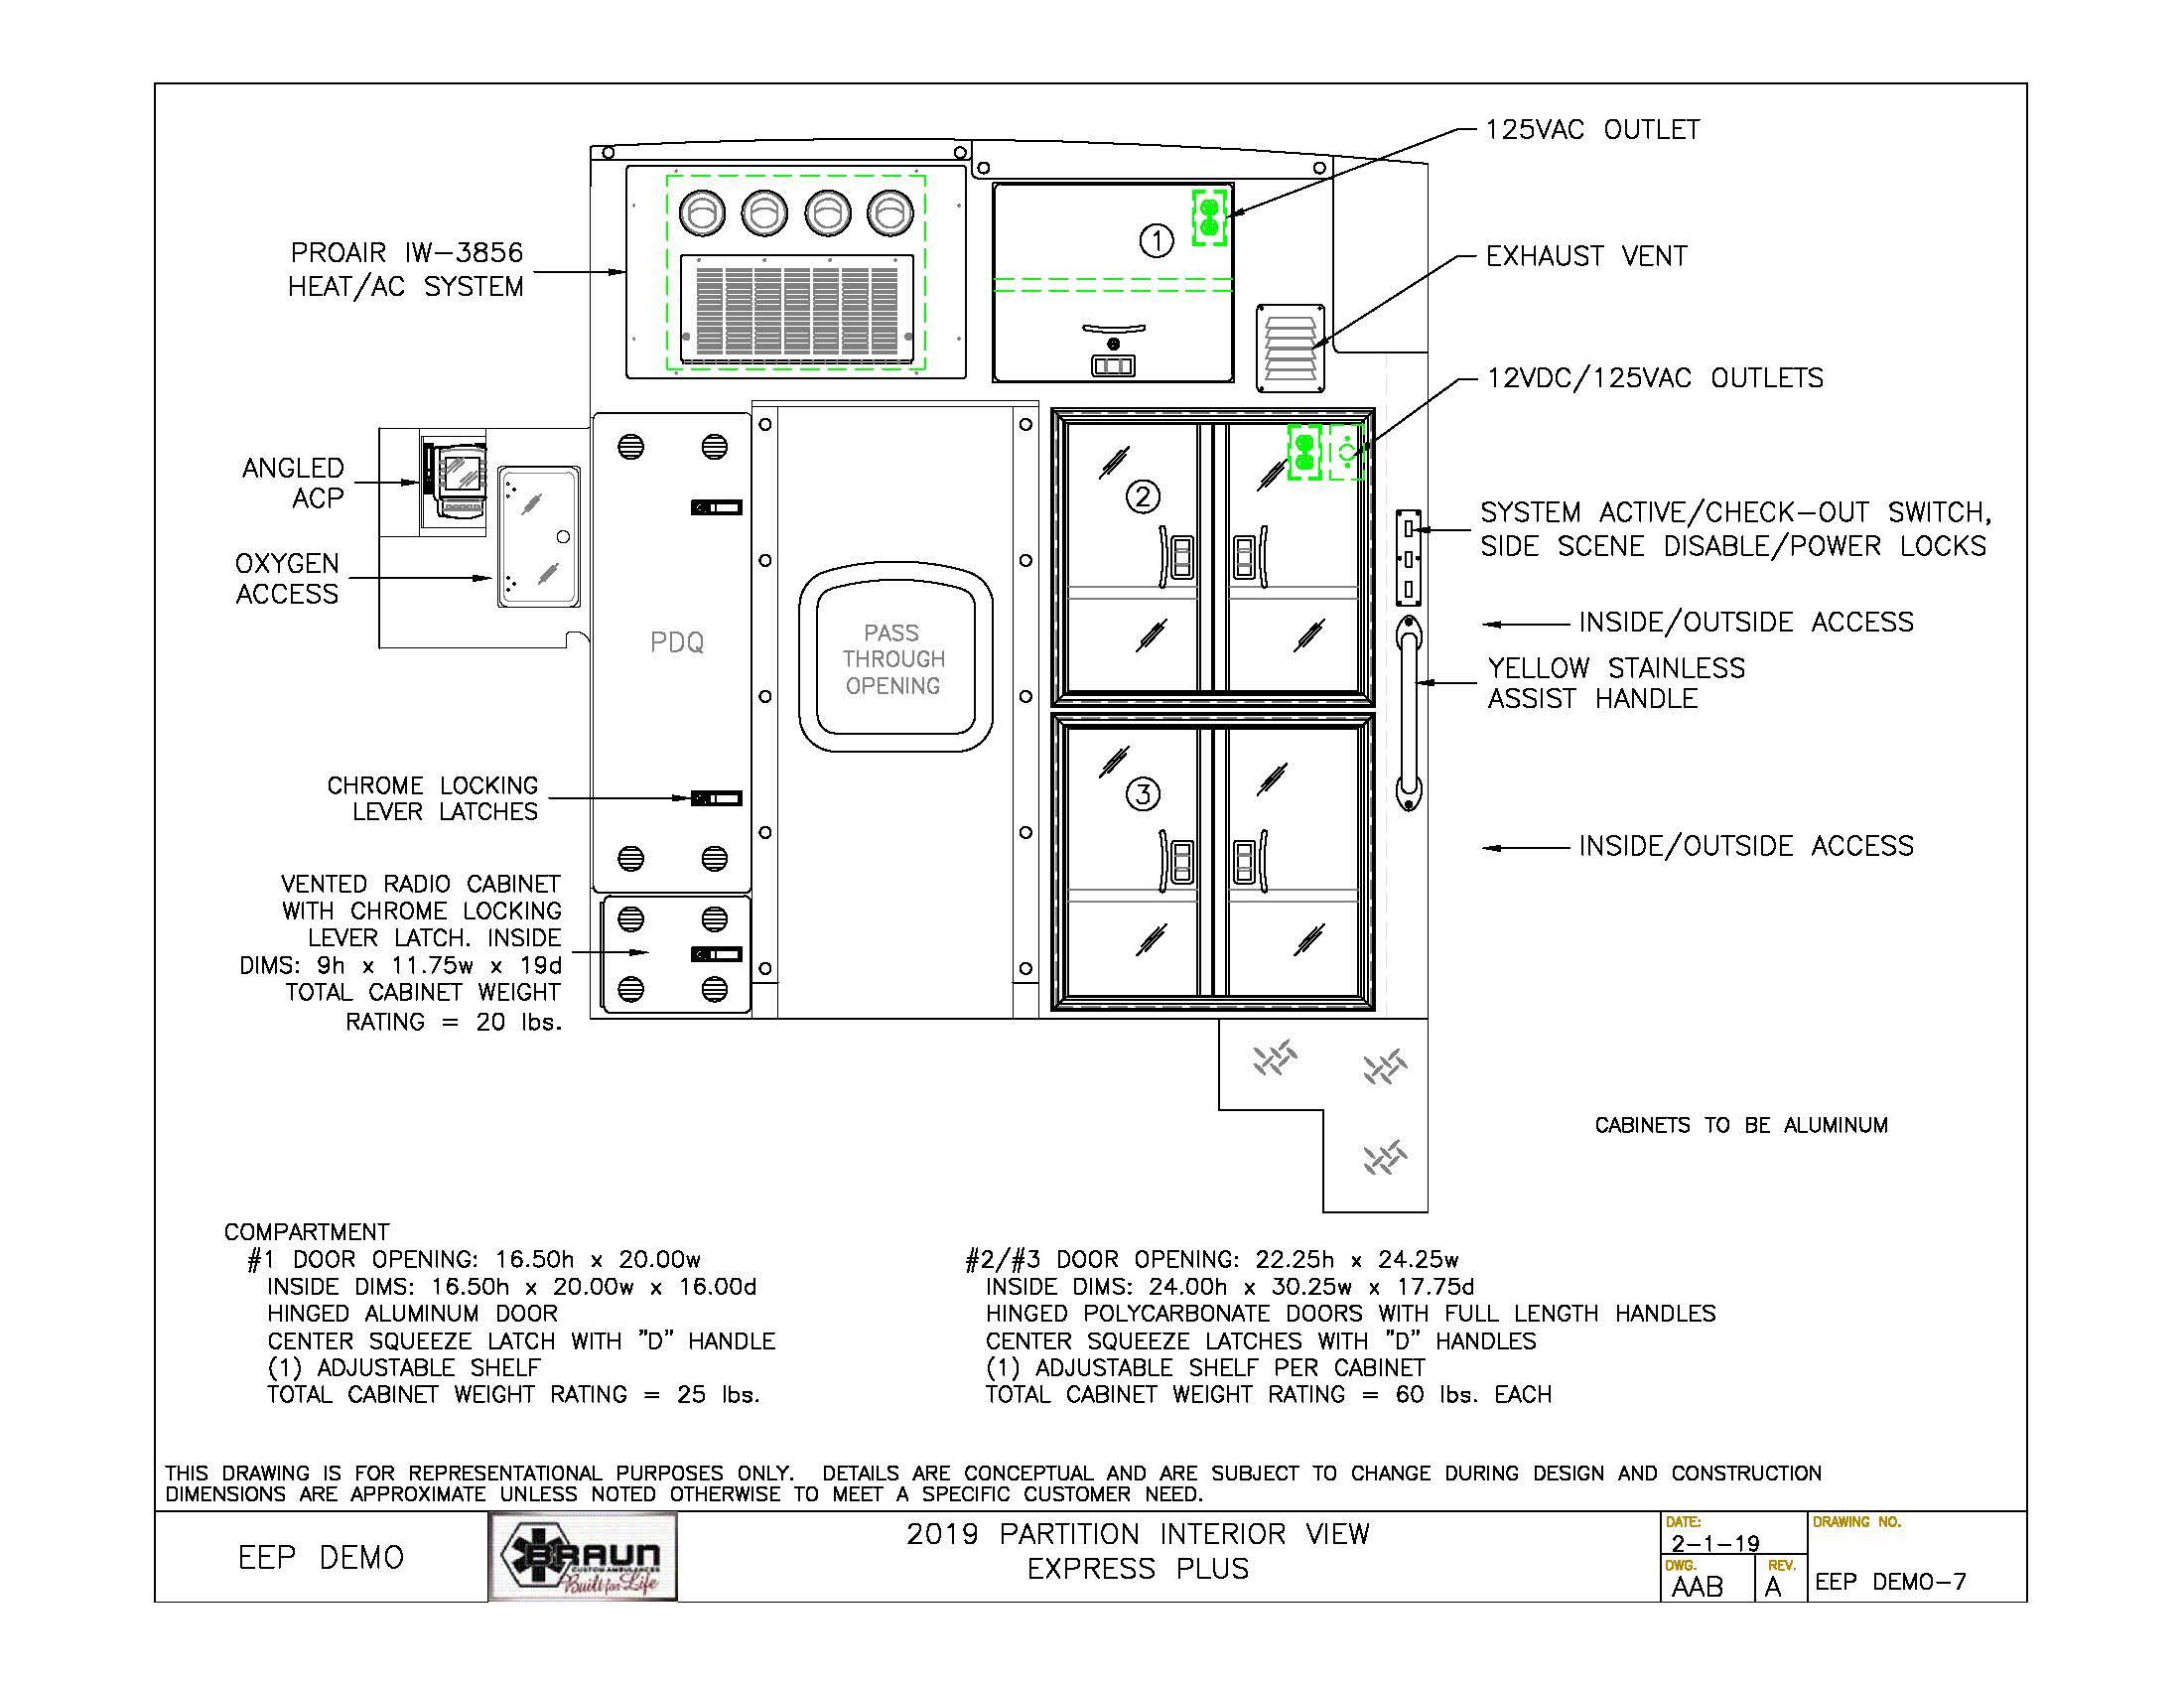 BRAUN - EEP STOCK UNIT - Express + Demo 2-1-19_Page_7